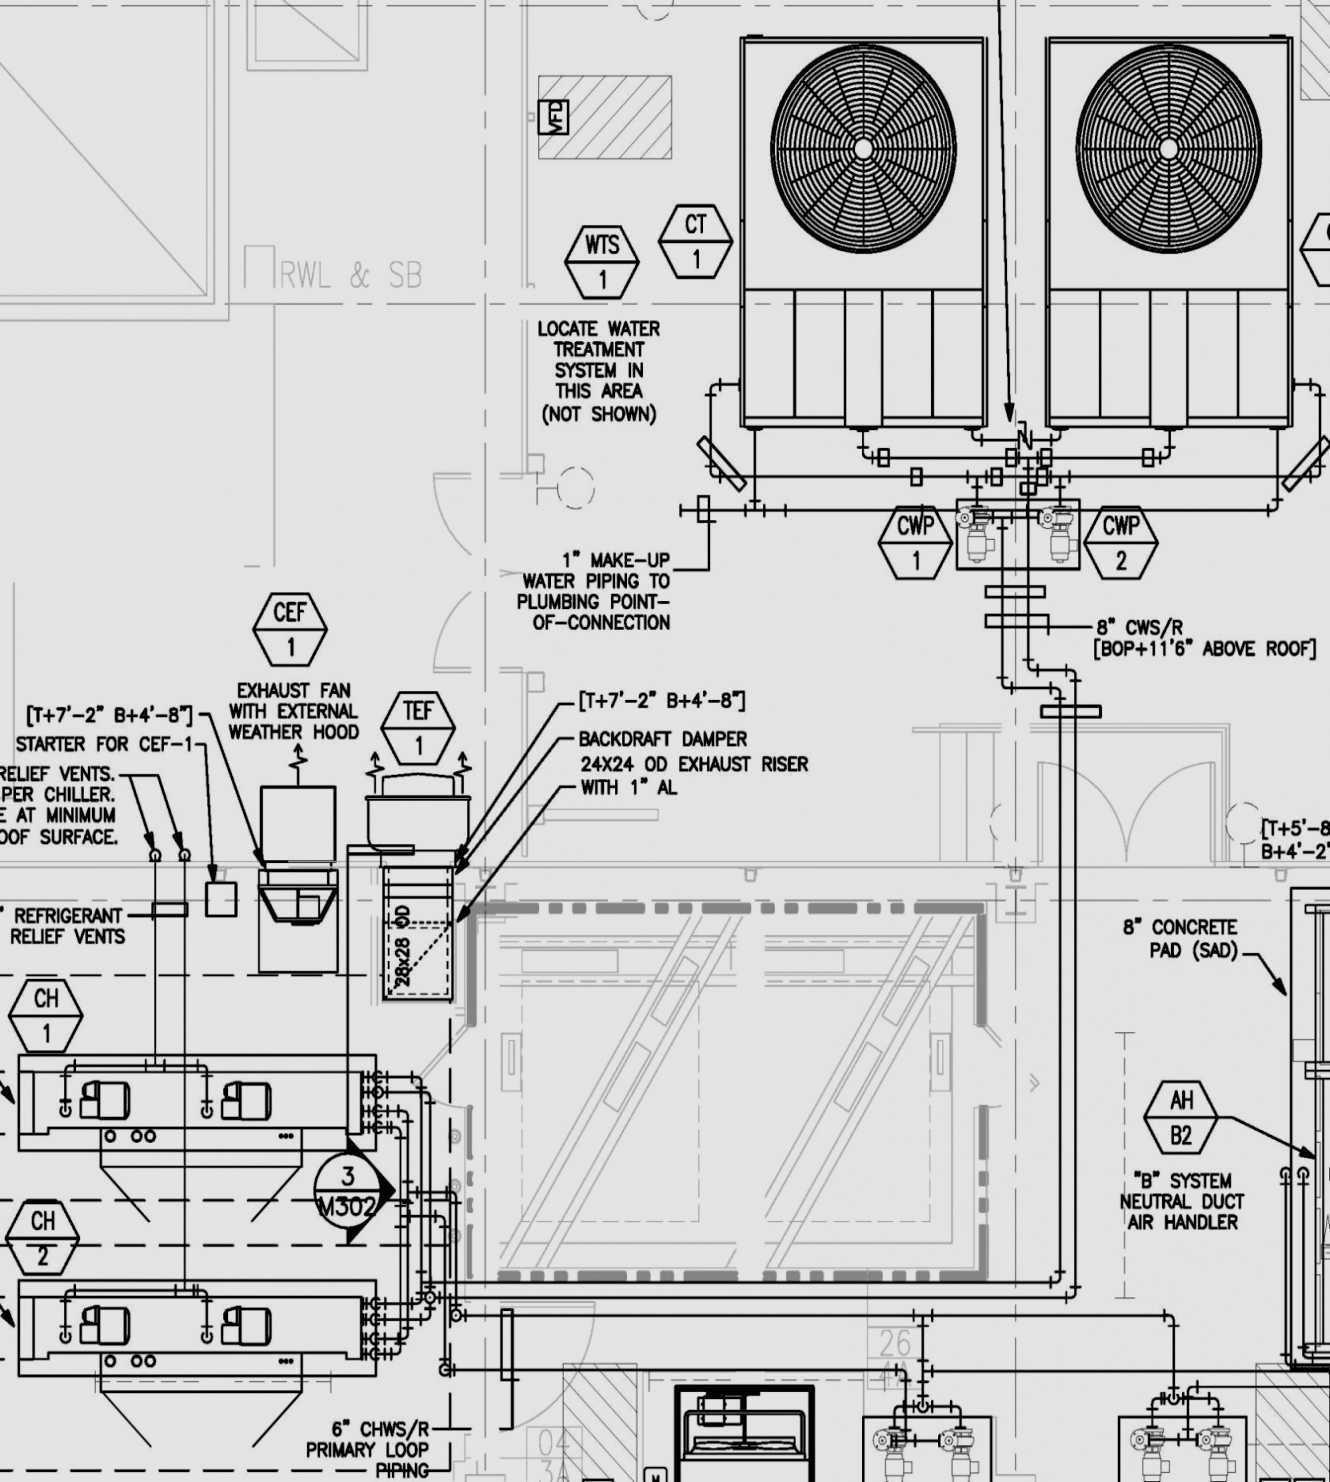 john deere 345 electrical schematic unique gator 6x4 wiring diagram of john deere 345 electrical schematic